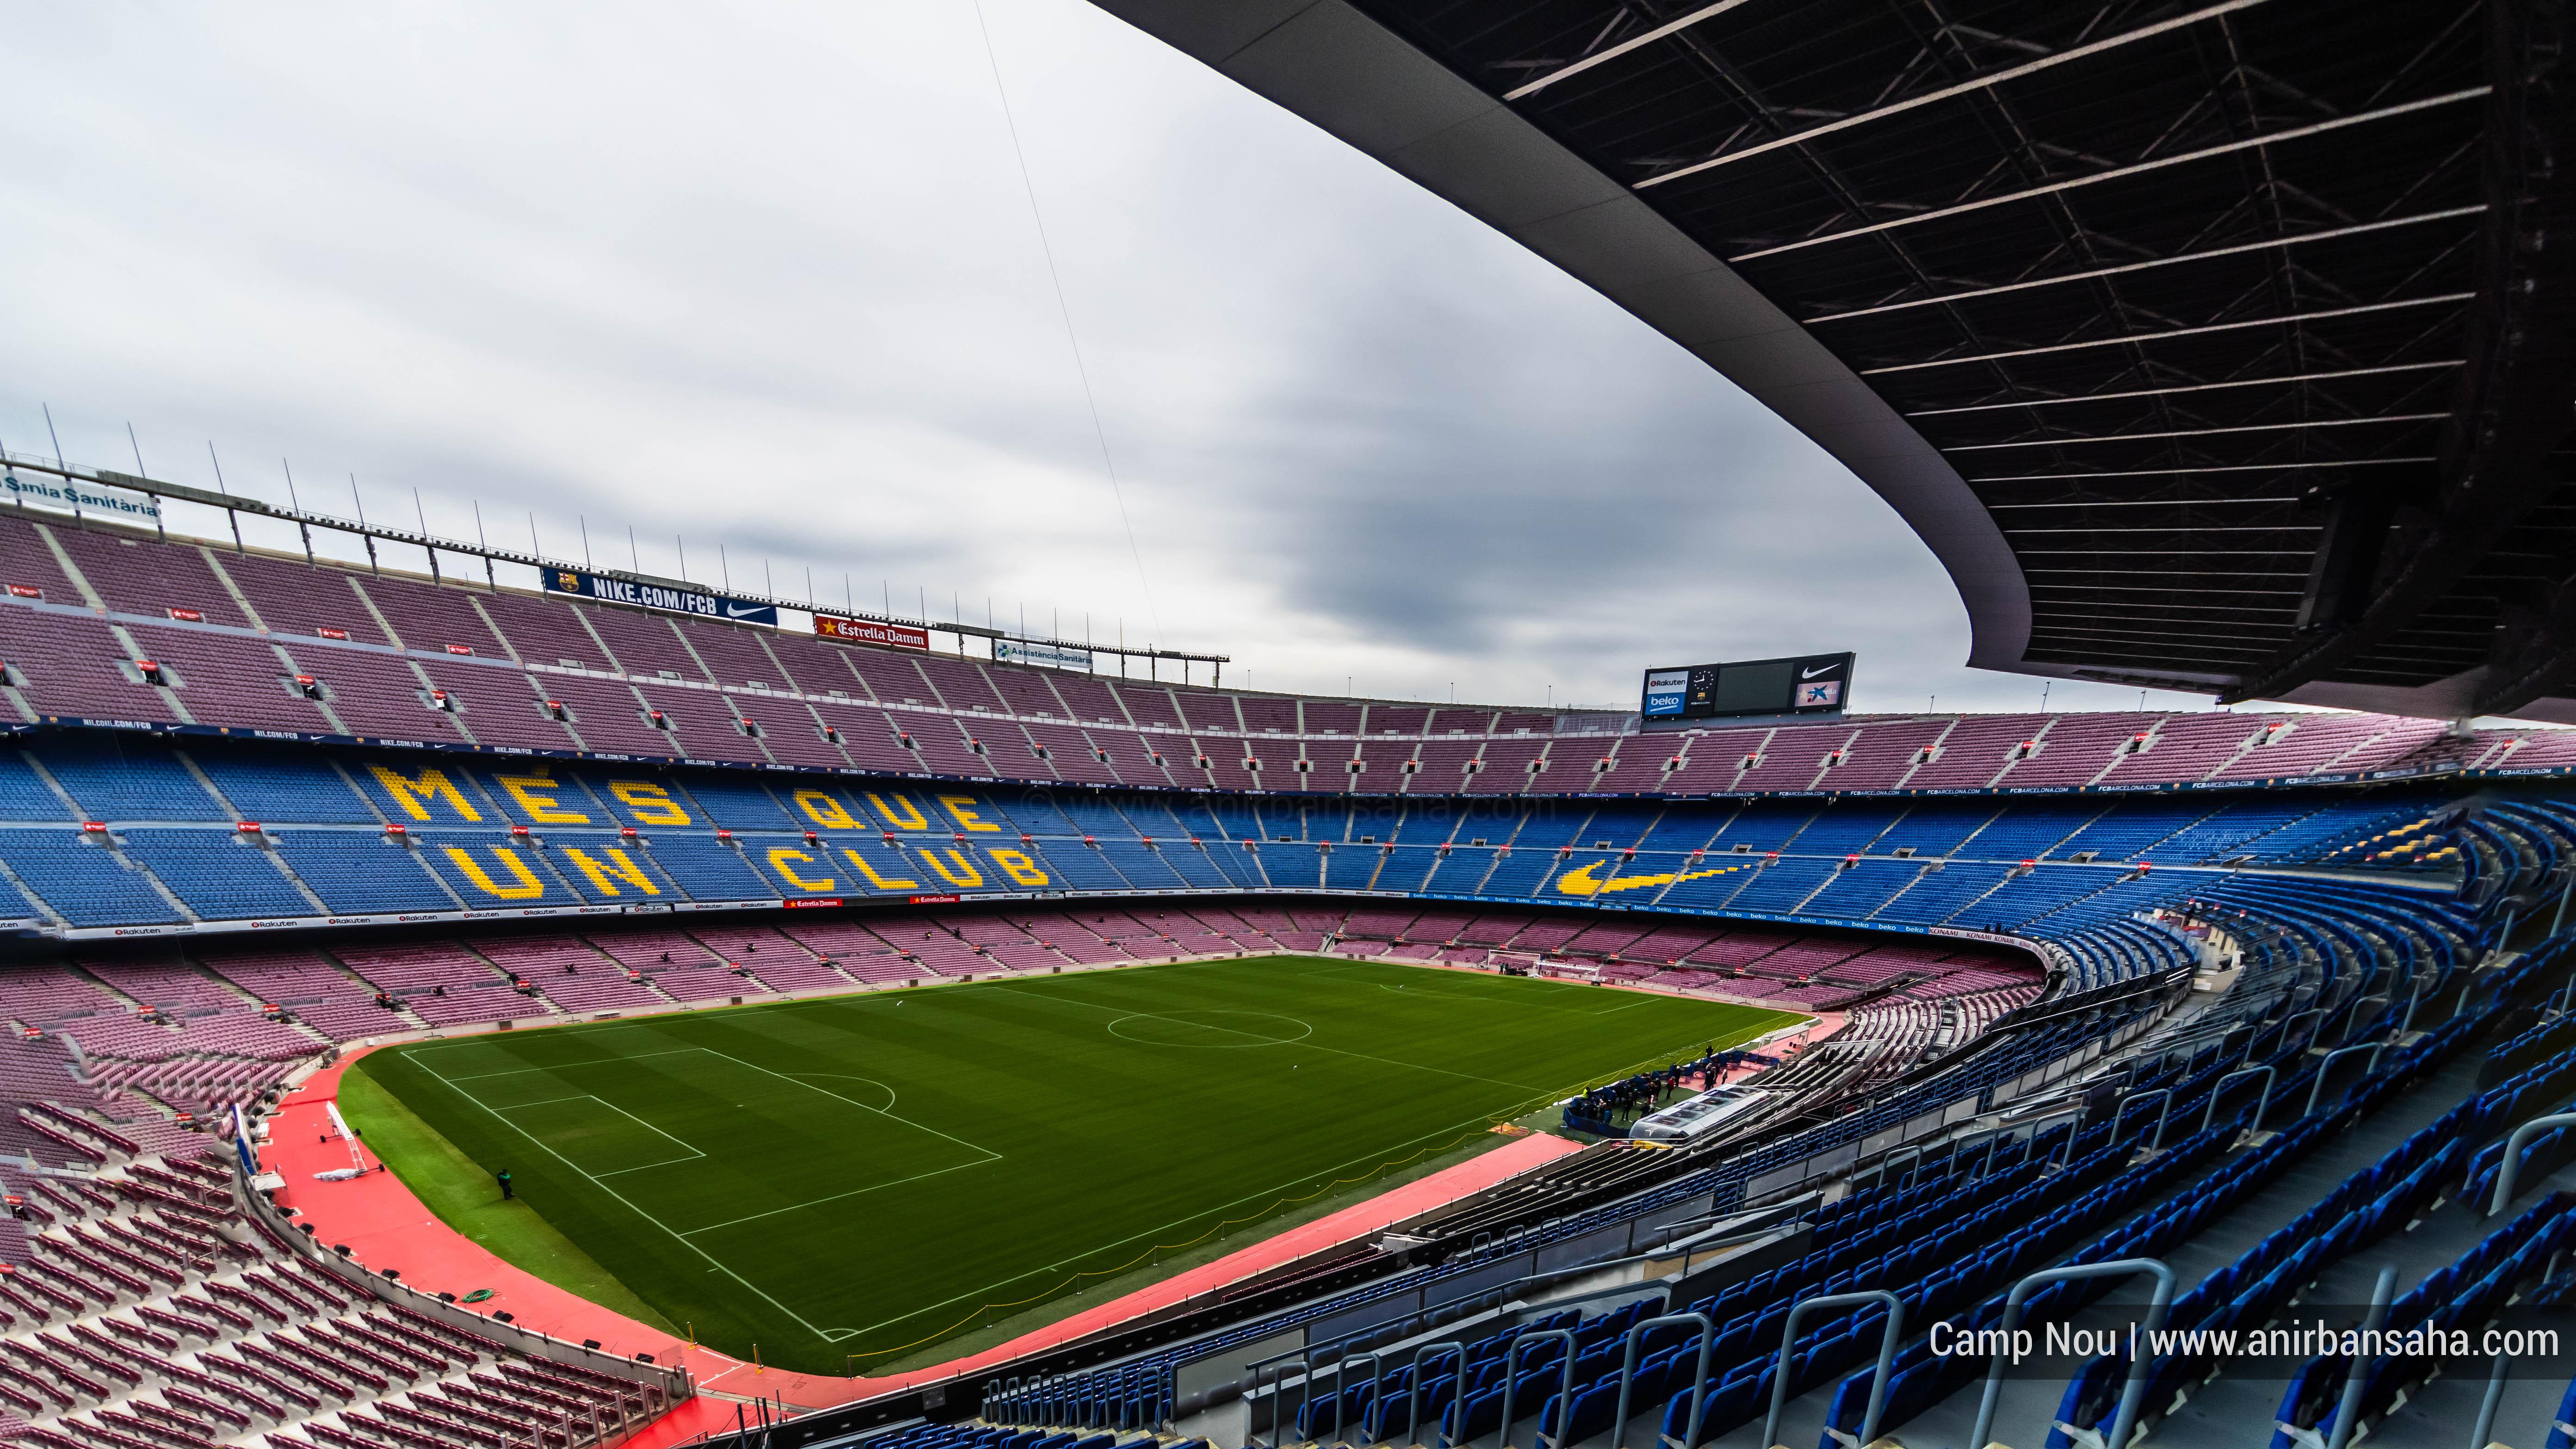 Camp Nou experience | Barcelona 2018